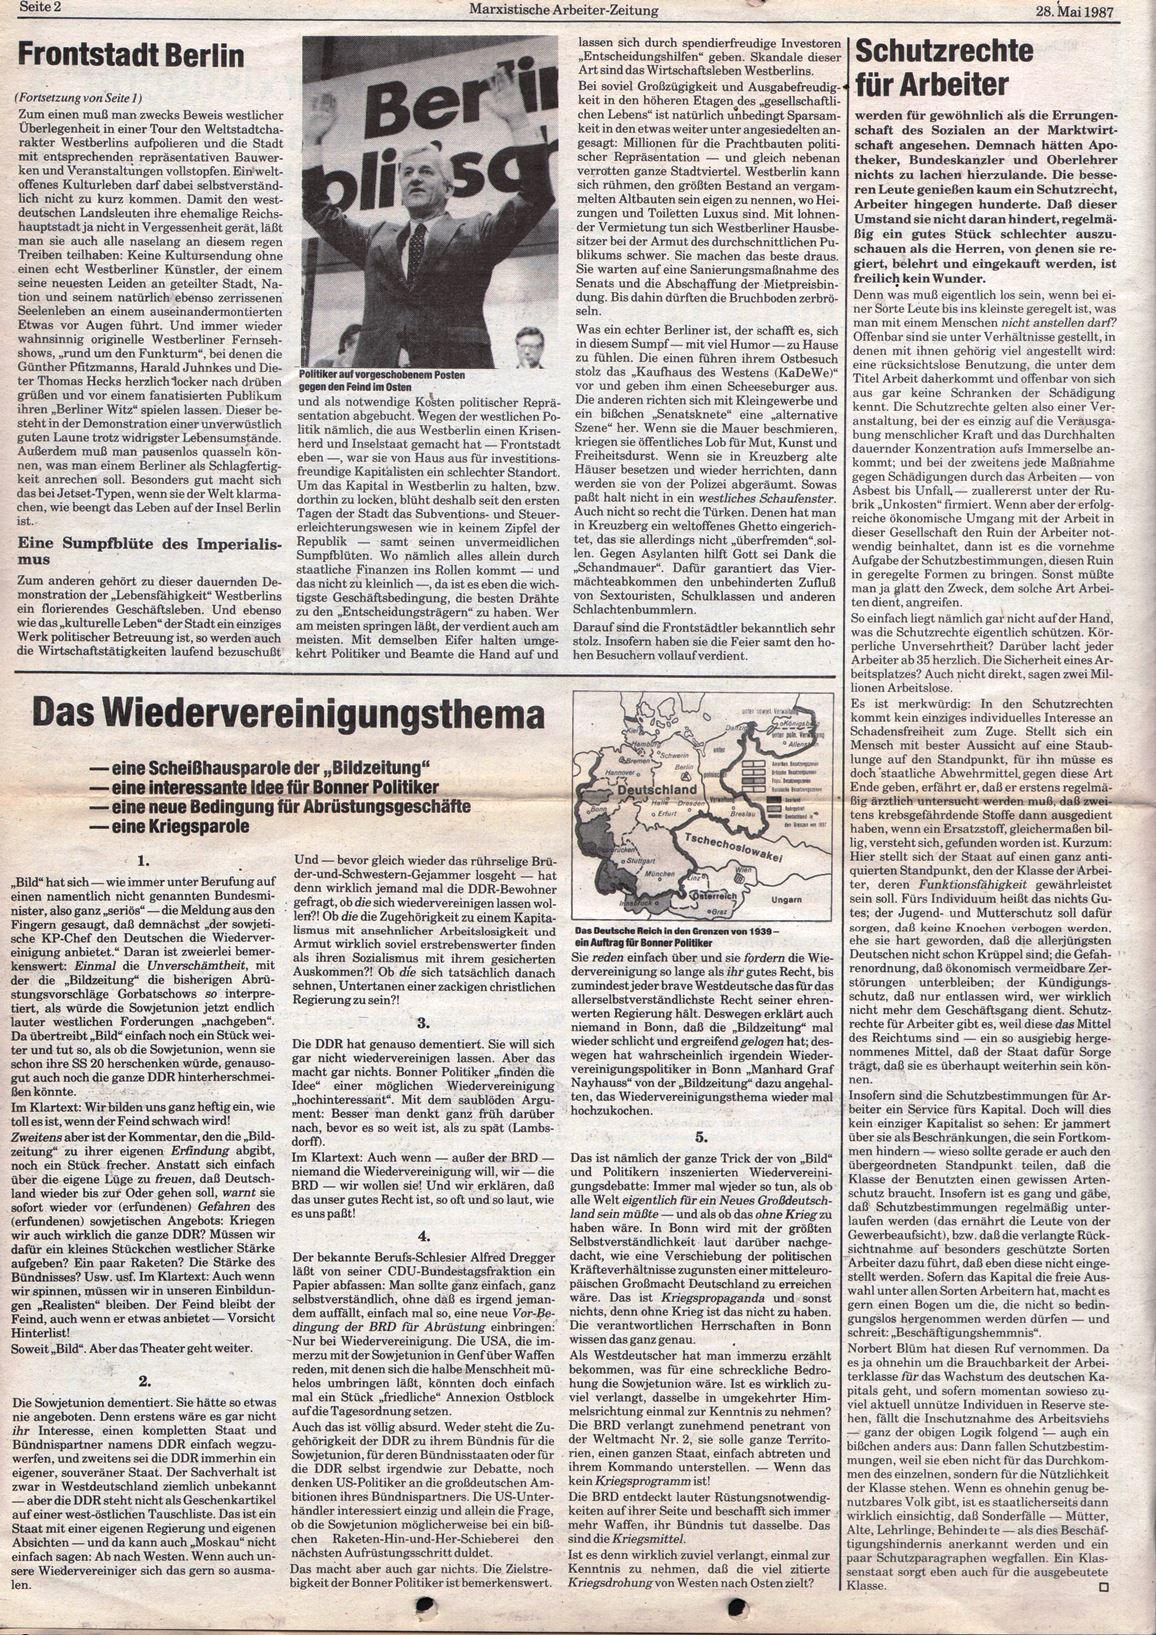 Muenchen_MG_MAZ_19870528_02